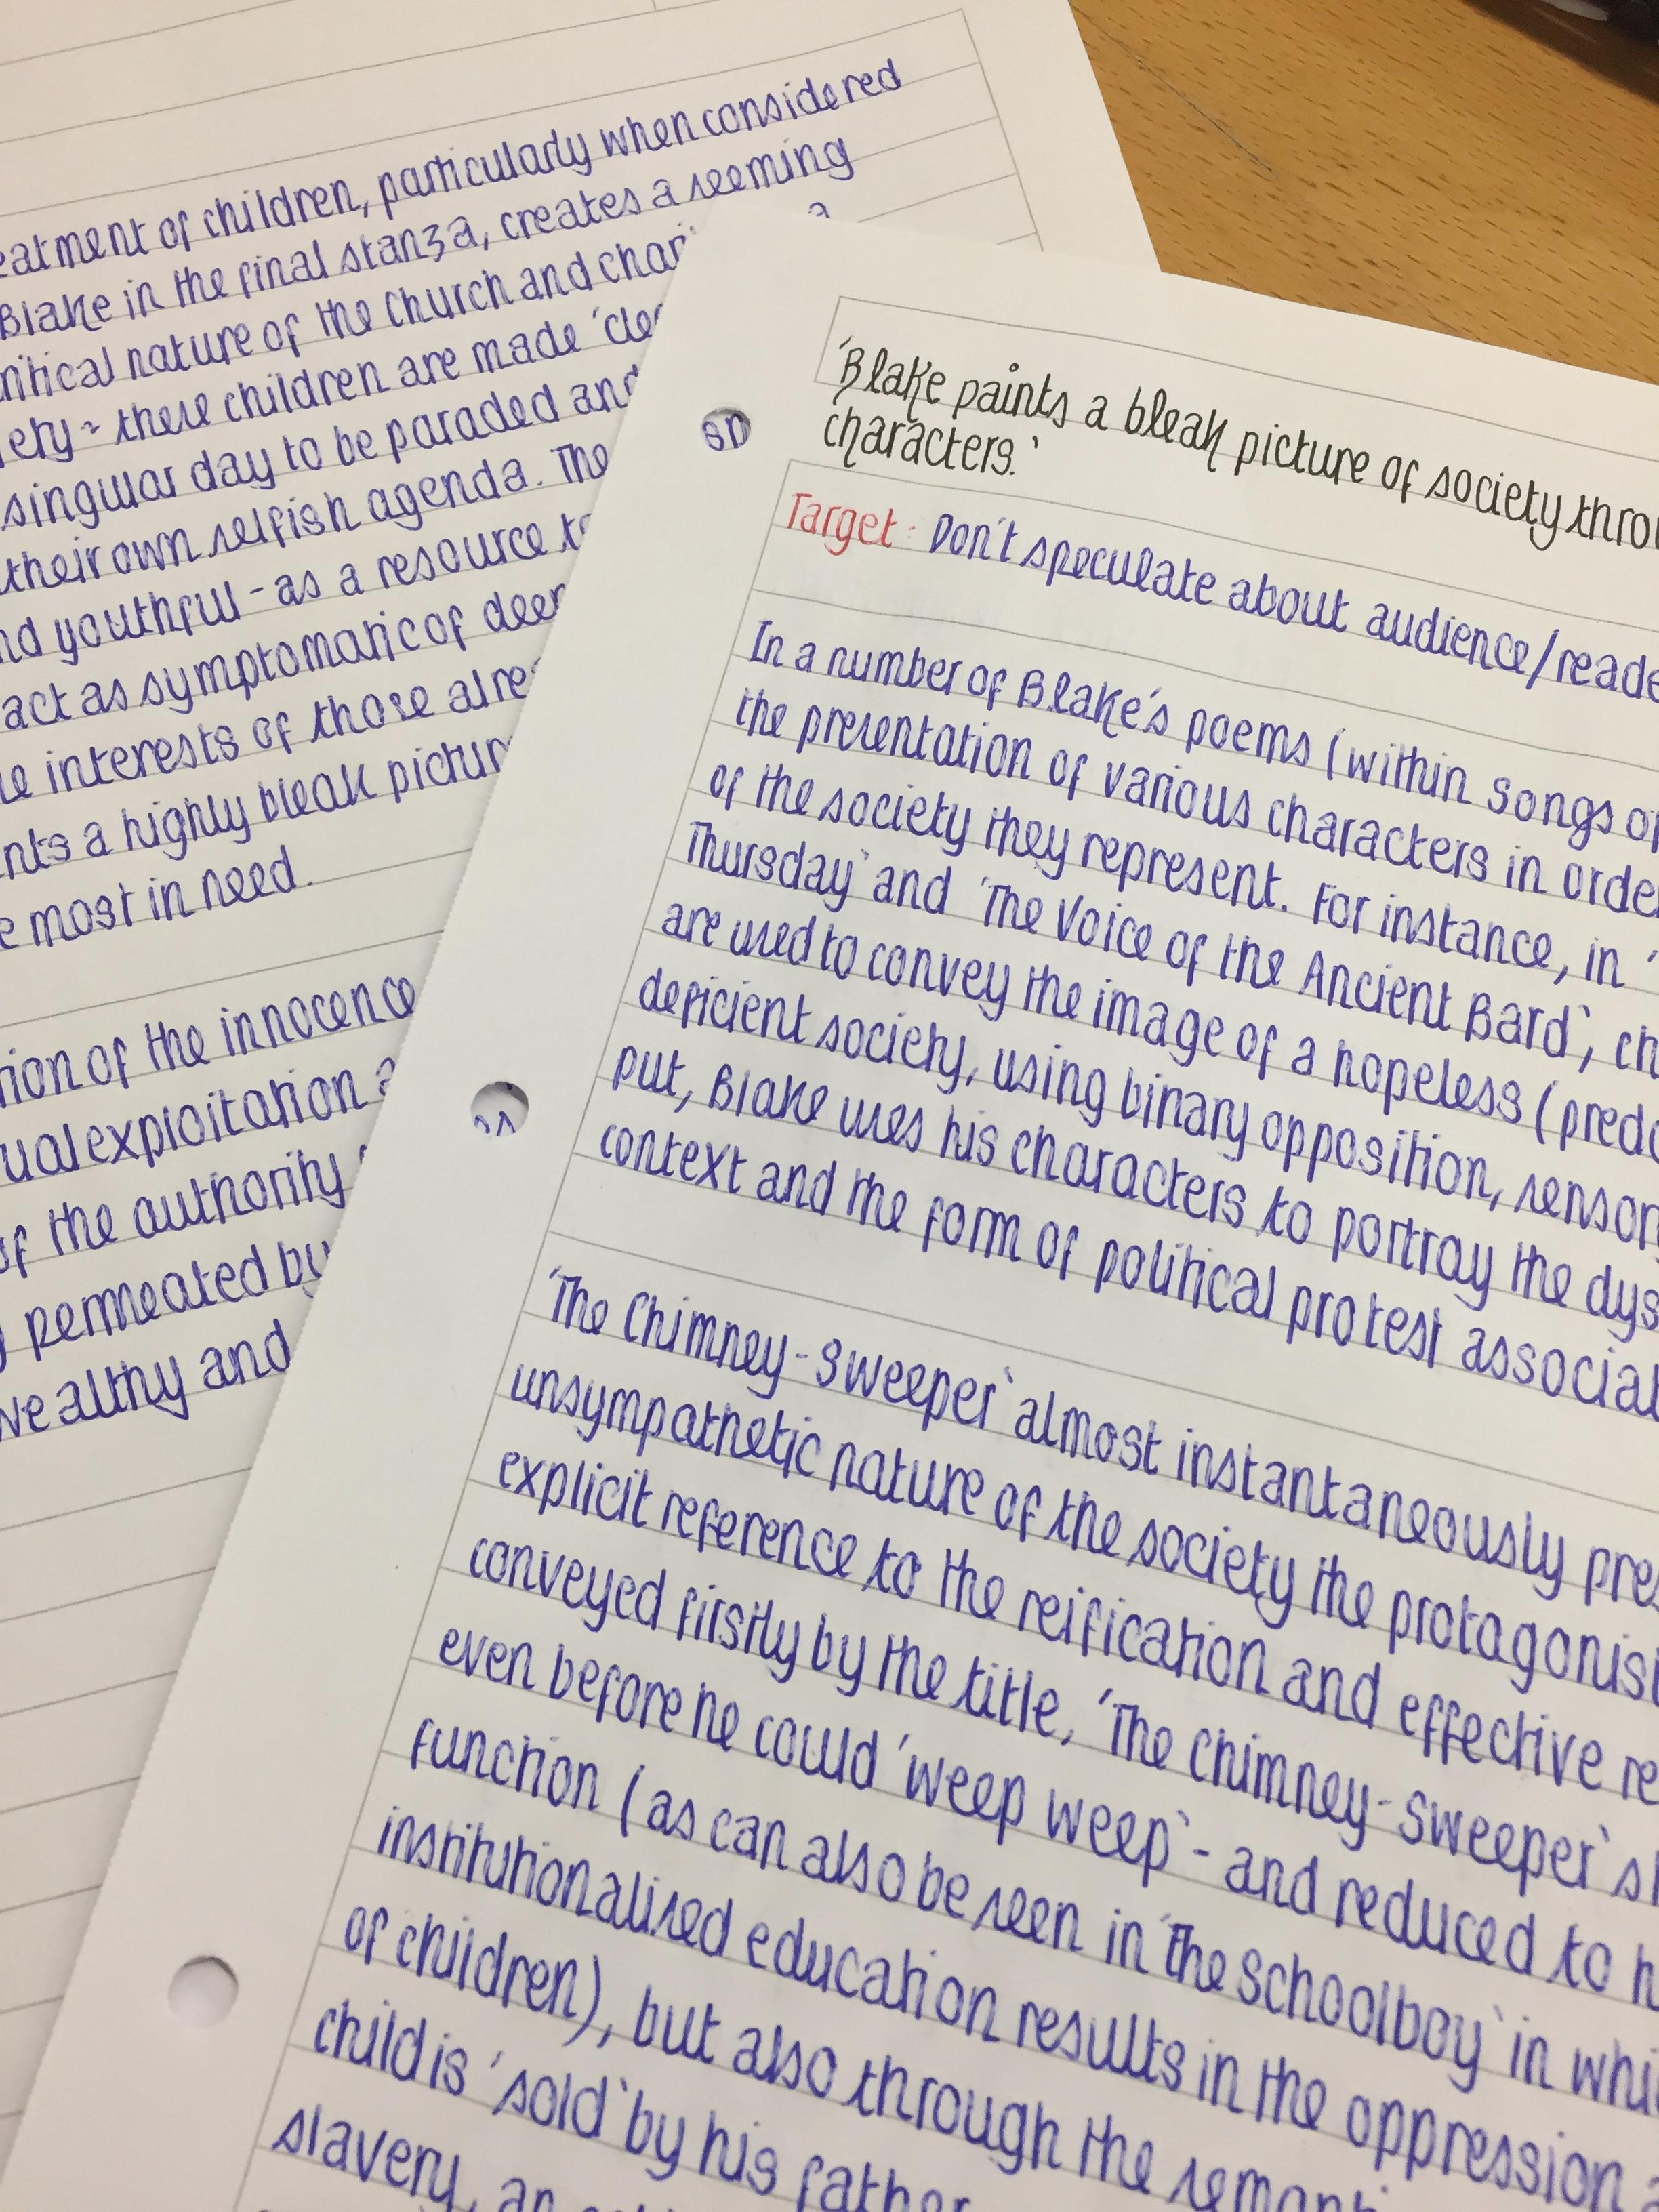 004 02scwurpga301 Essay On Handwriting Fearsome Short Importance Of Good In Hindi Gujarati Full